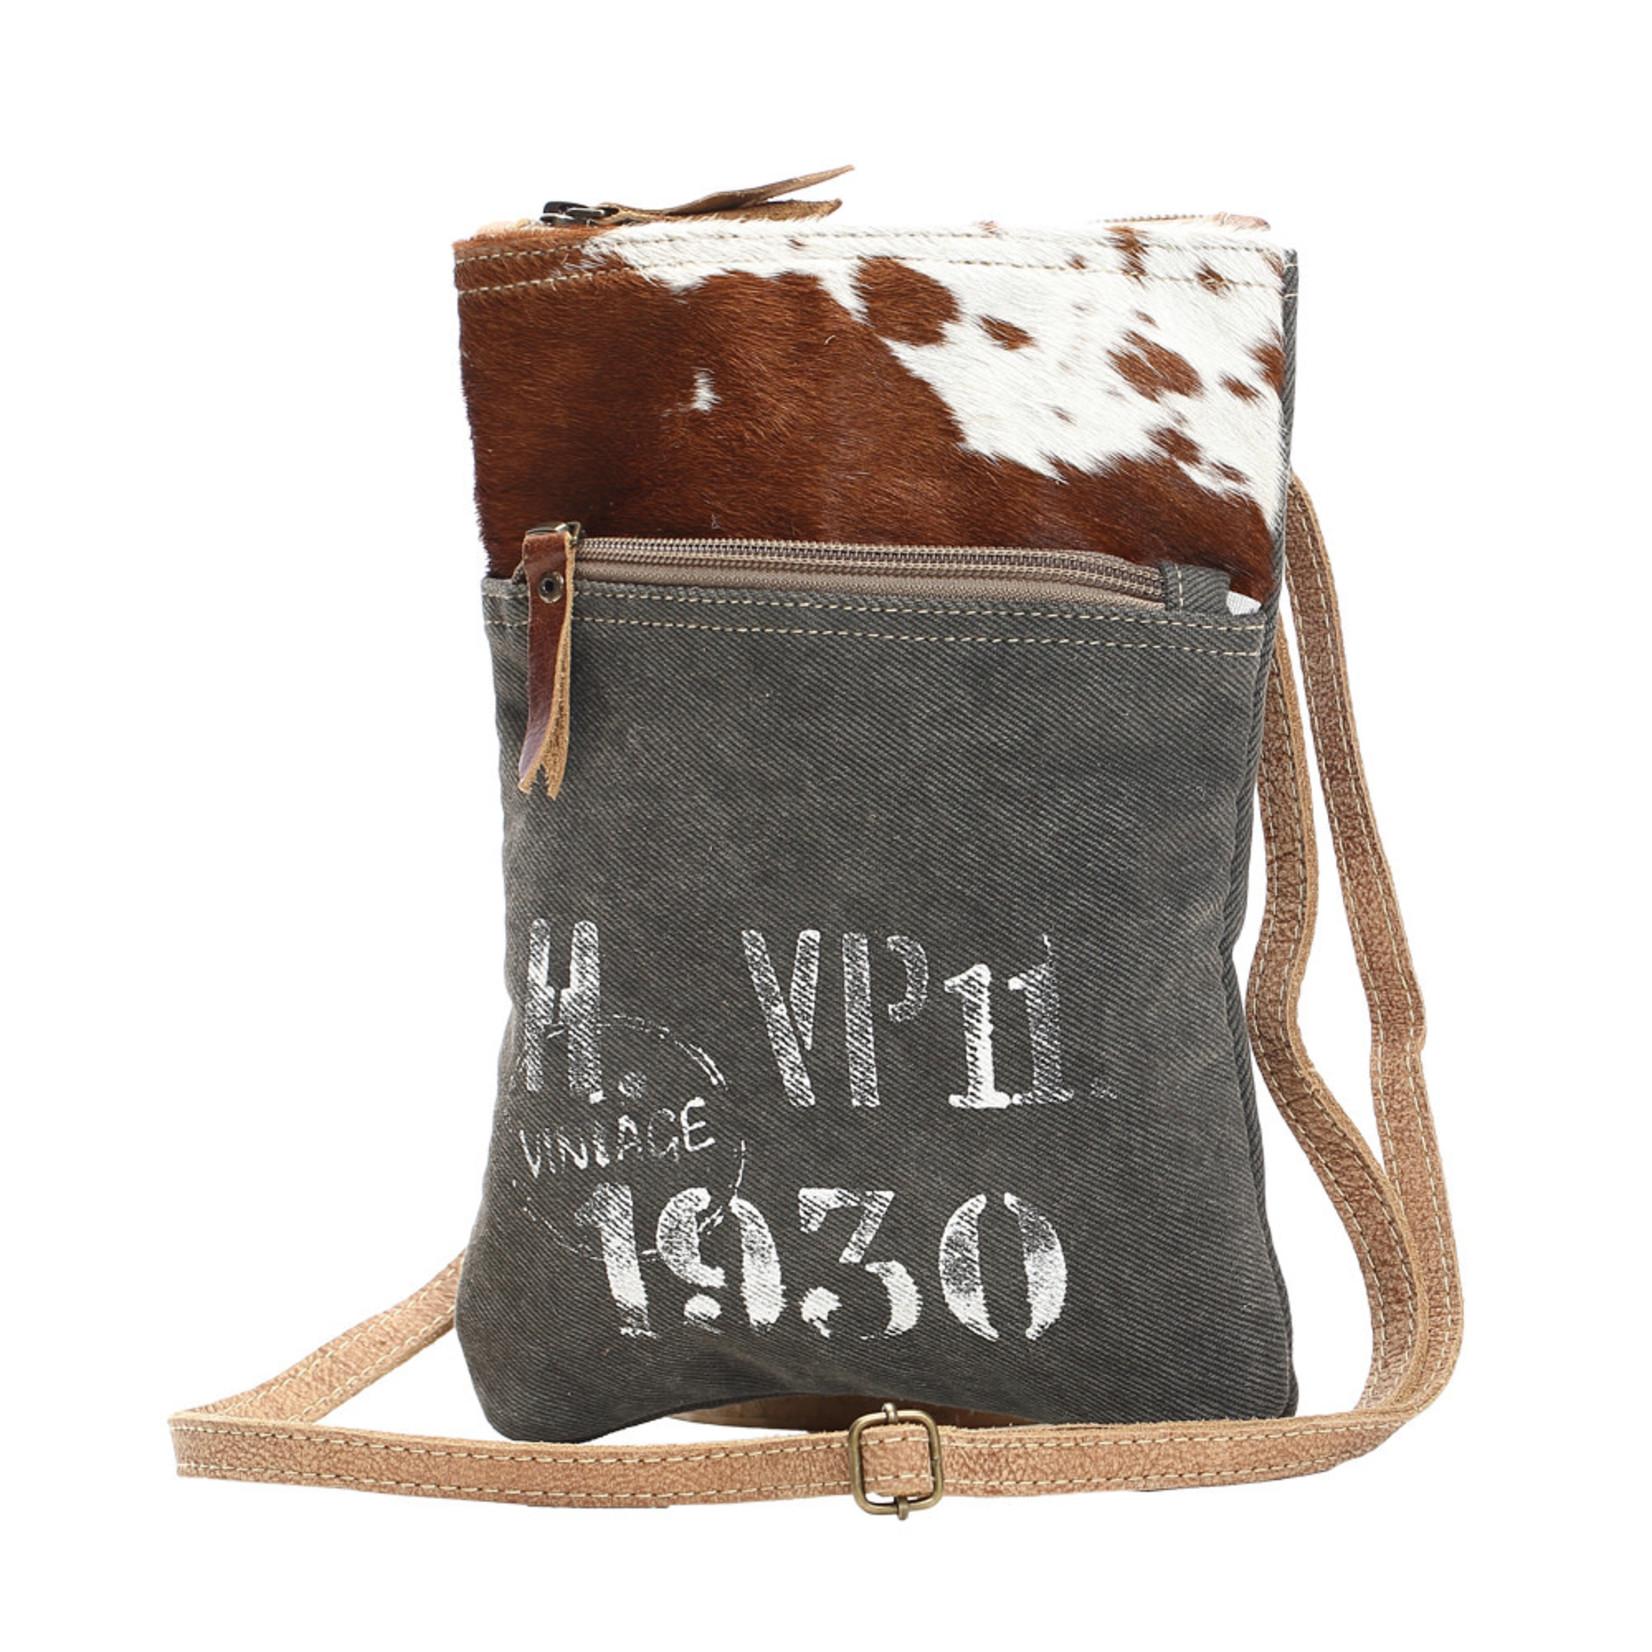 Myra Bags S-1156 VP 11 Crossbody